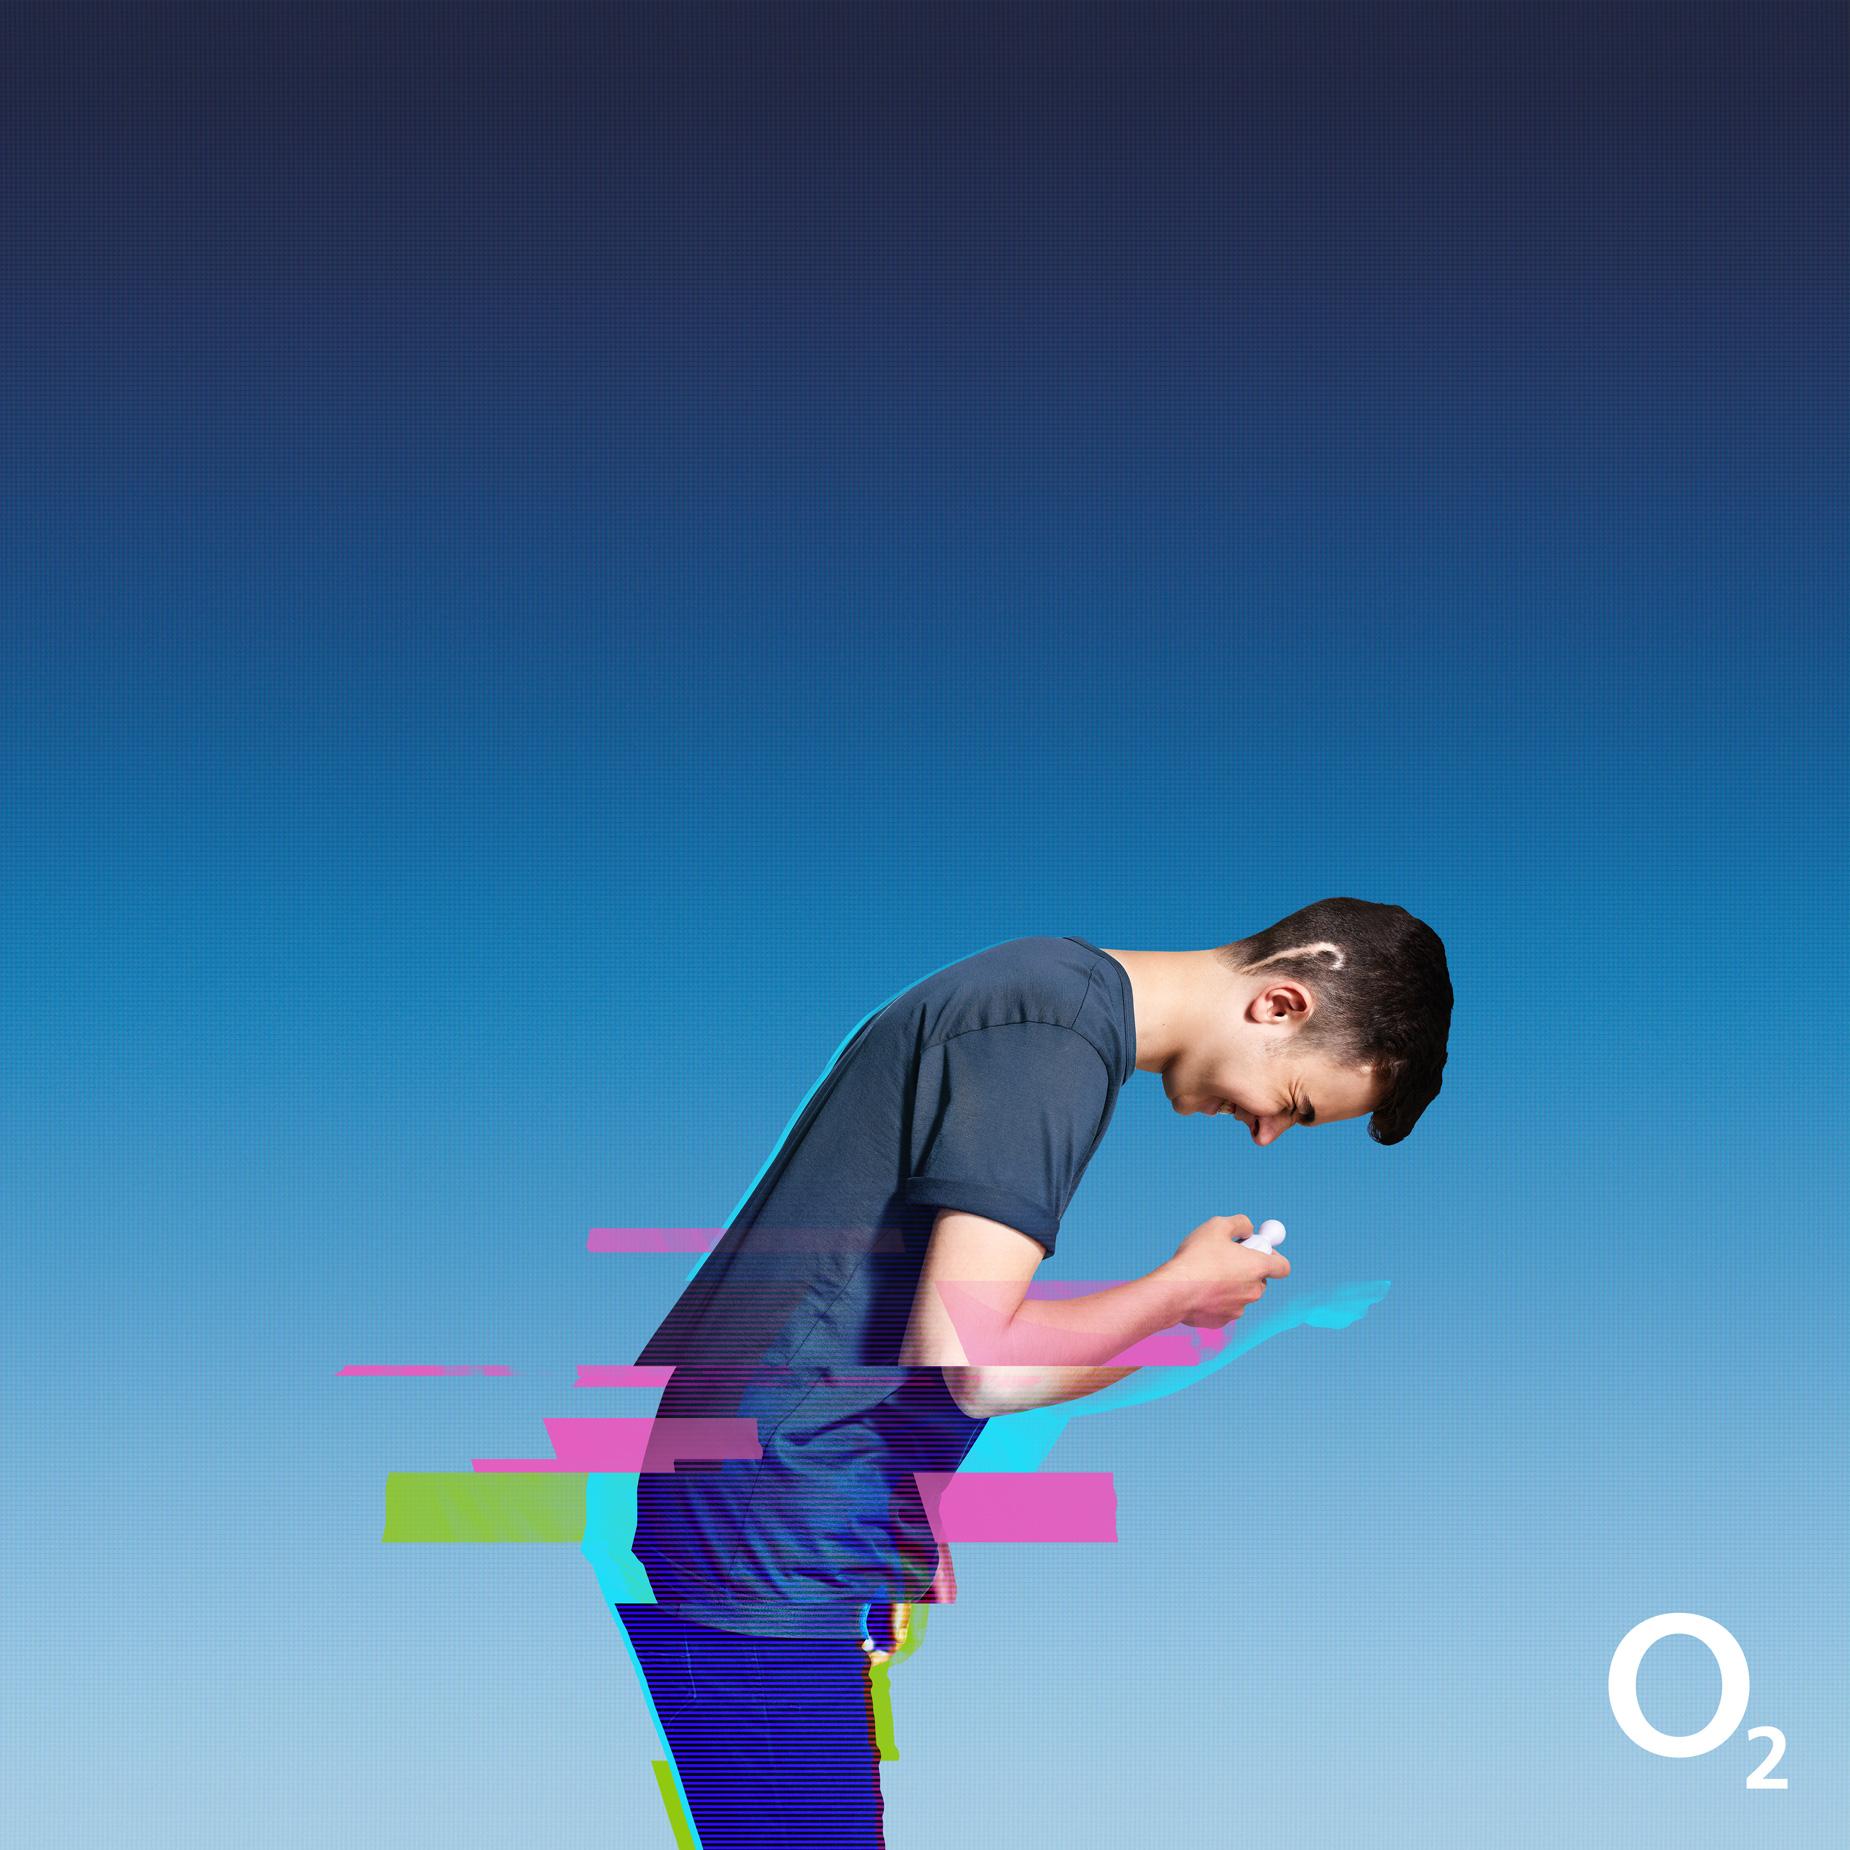 O2-Go-Think-Big-Lewis-Hine-1-Small-RGB